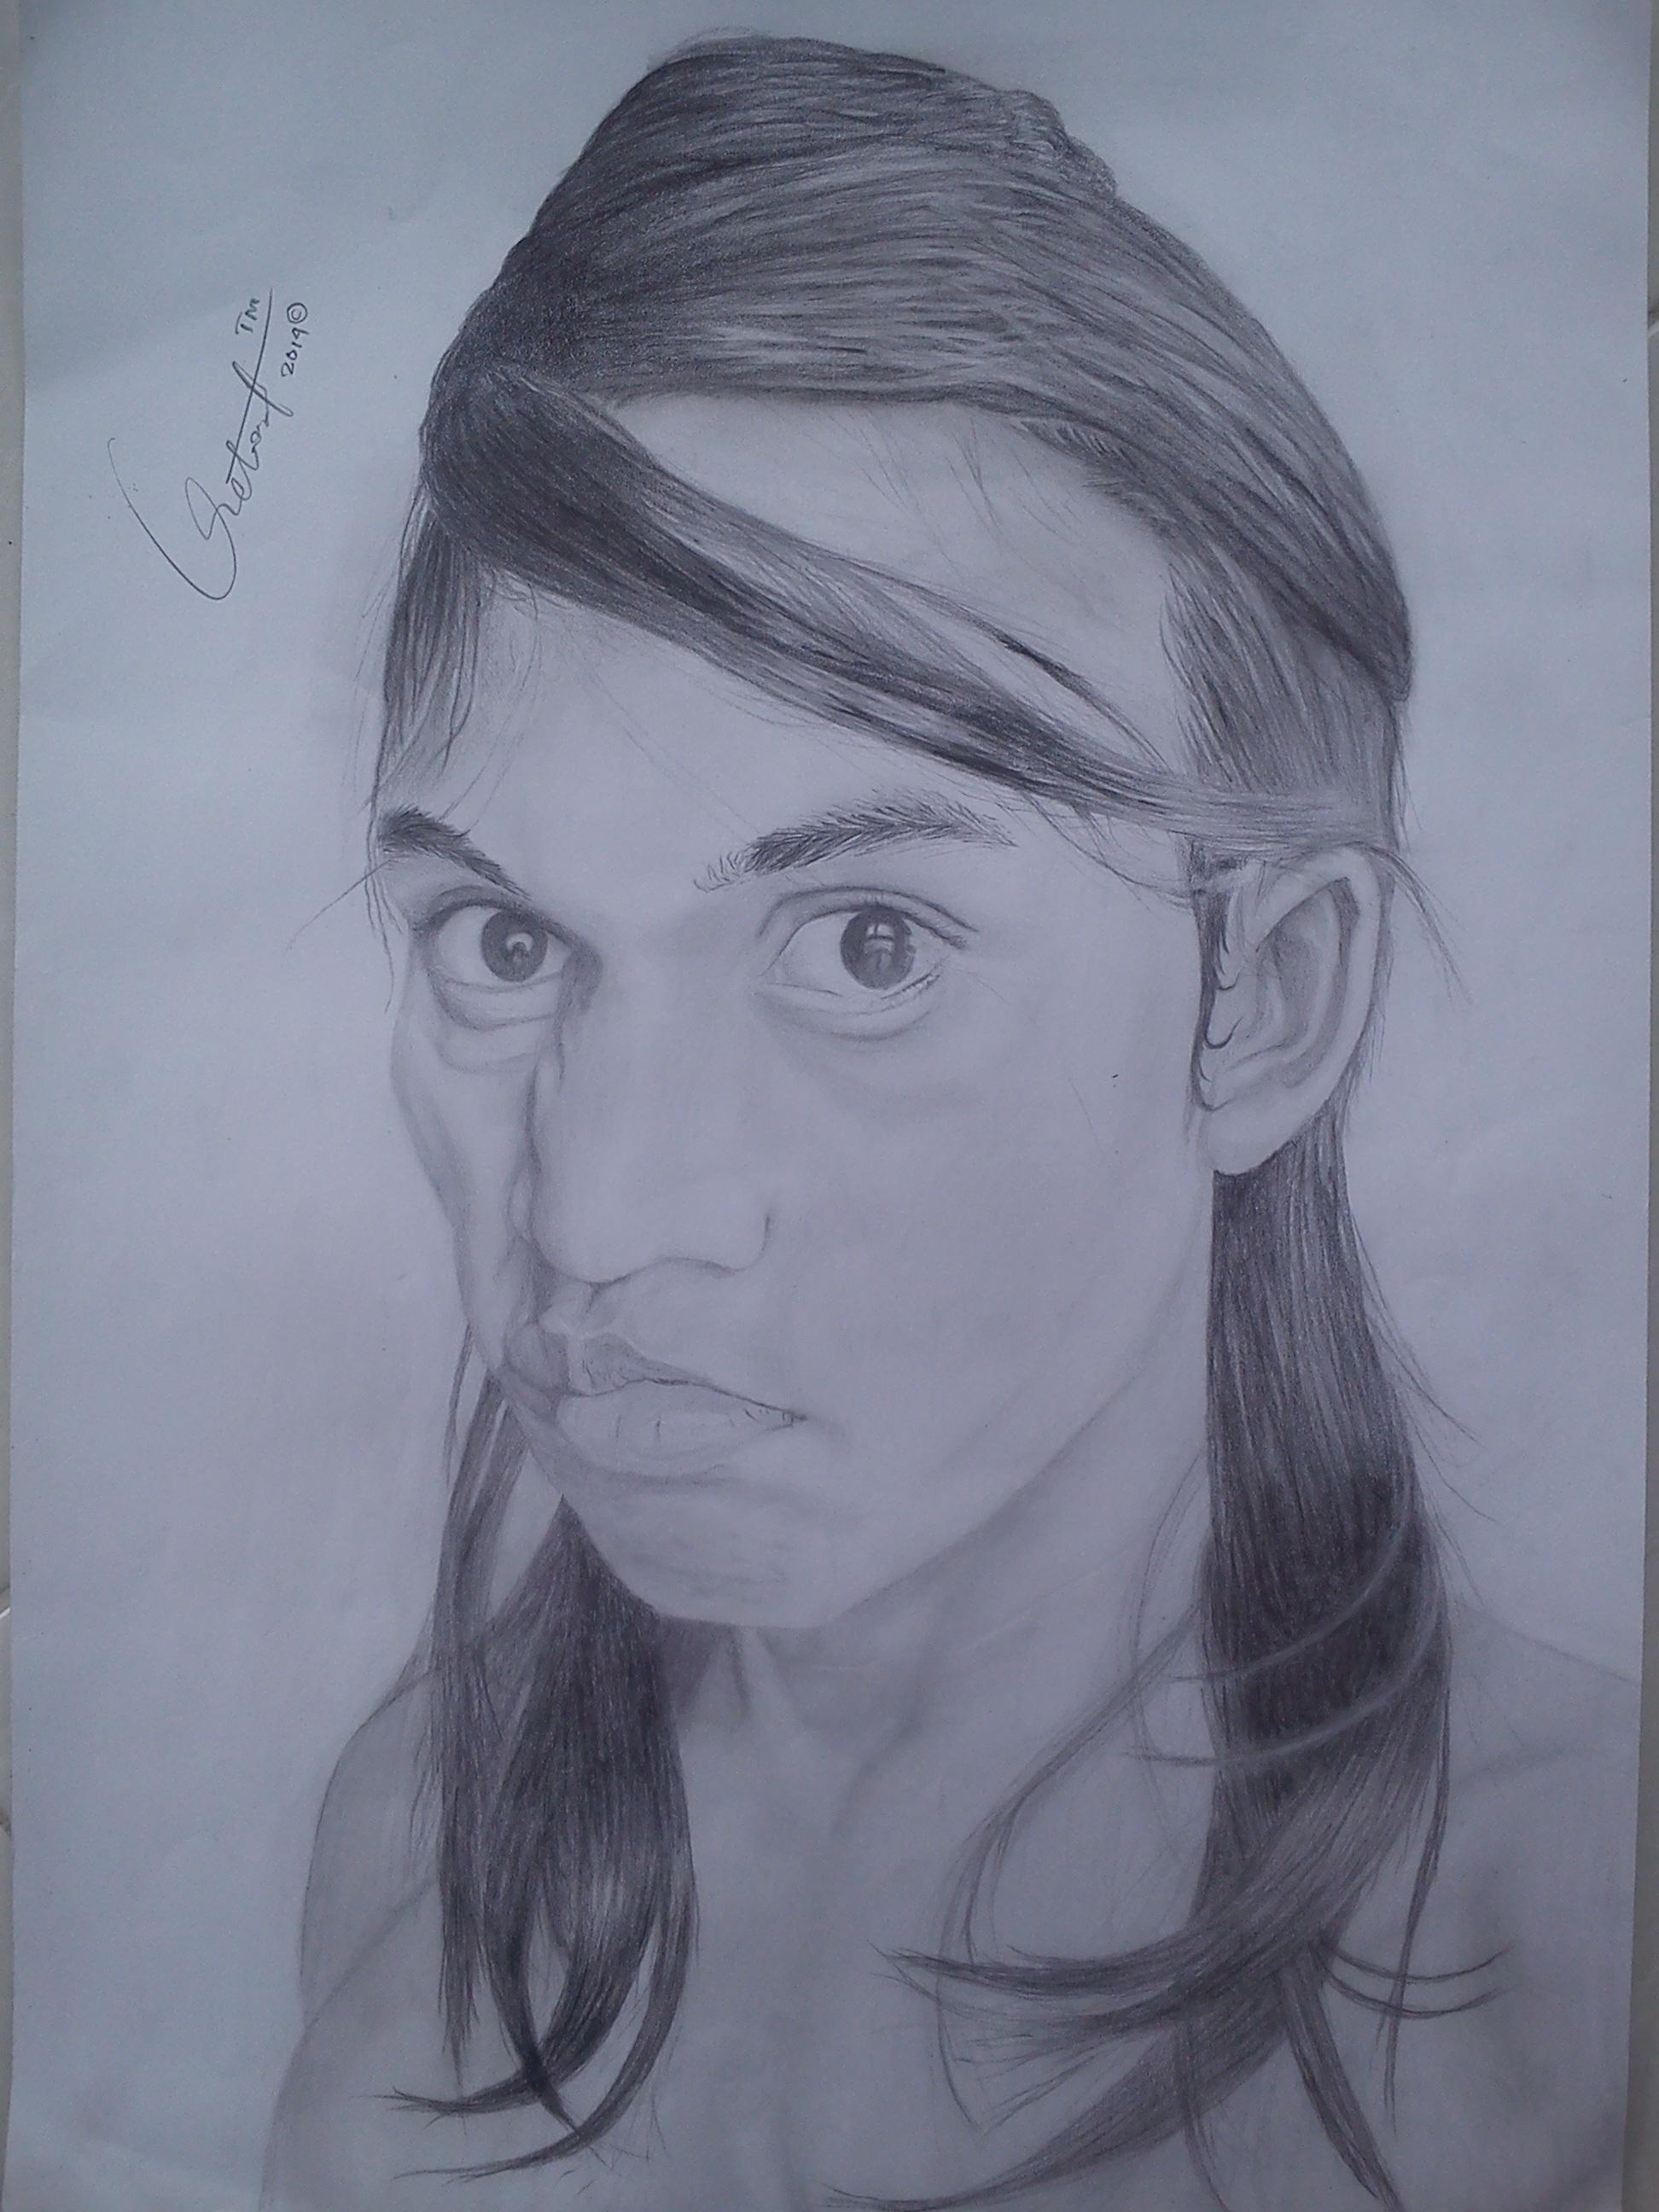 Pencil portrait artwork face sketch drawing illustration head draw art model figure drawing